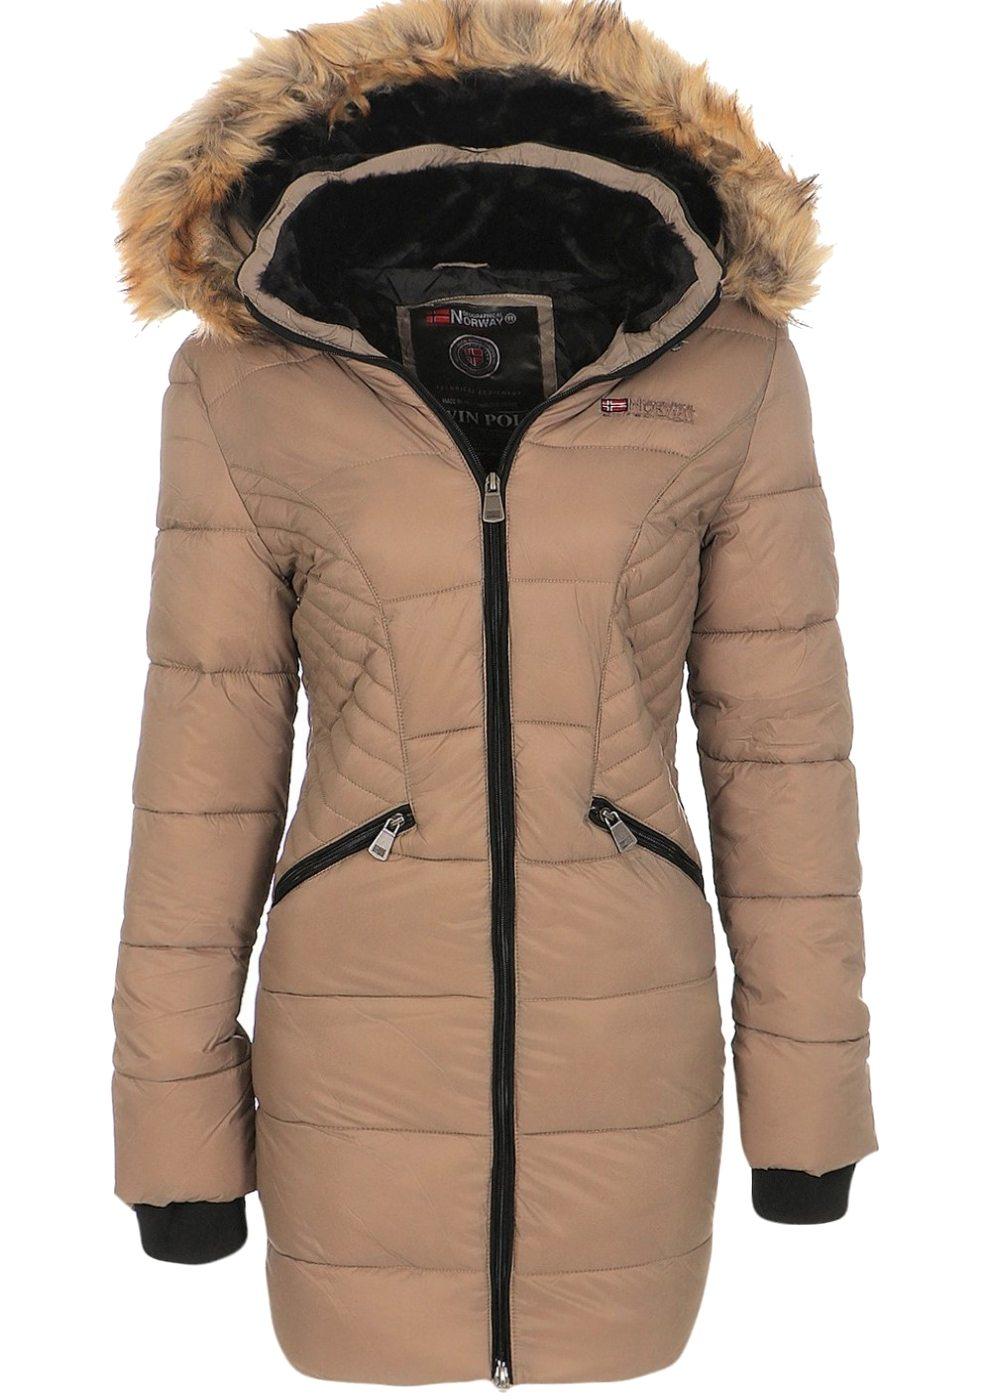 geographical norway damen winter mantel jacke coat parka steppmantel anorak ebay. Black Bedroom Furniture Sets. Home Design Ideas